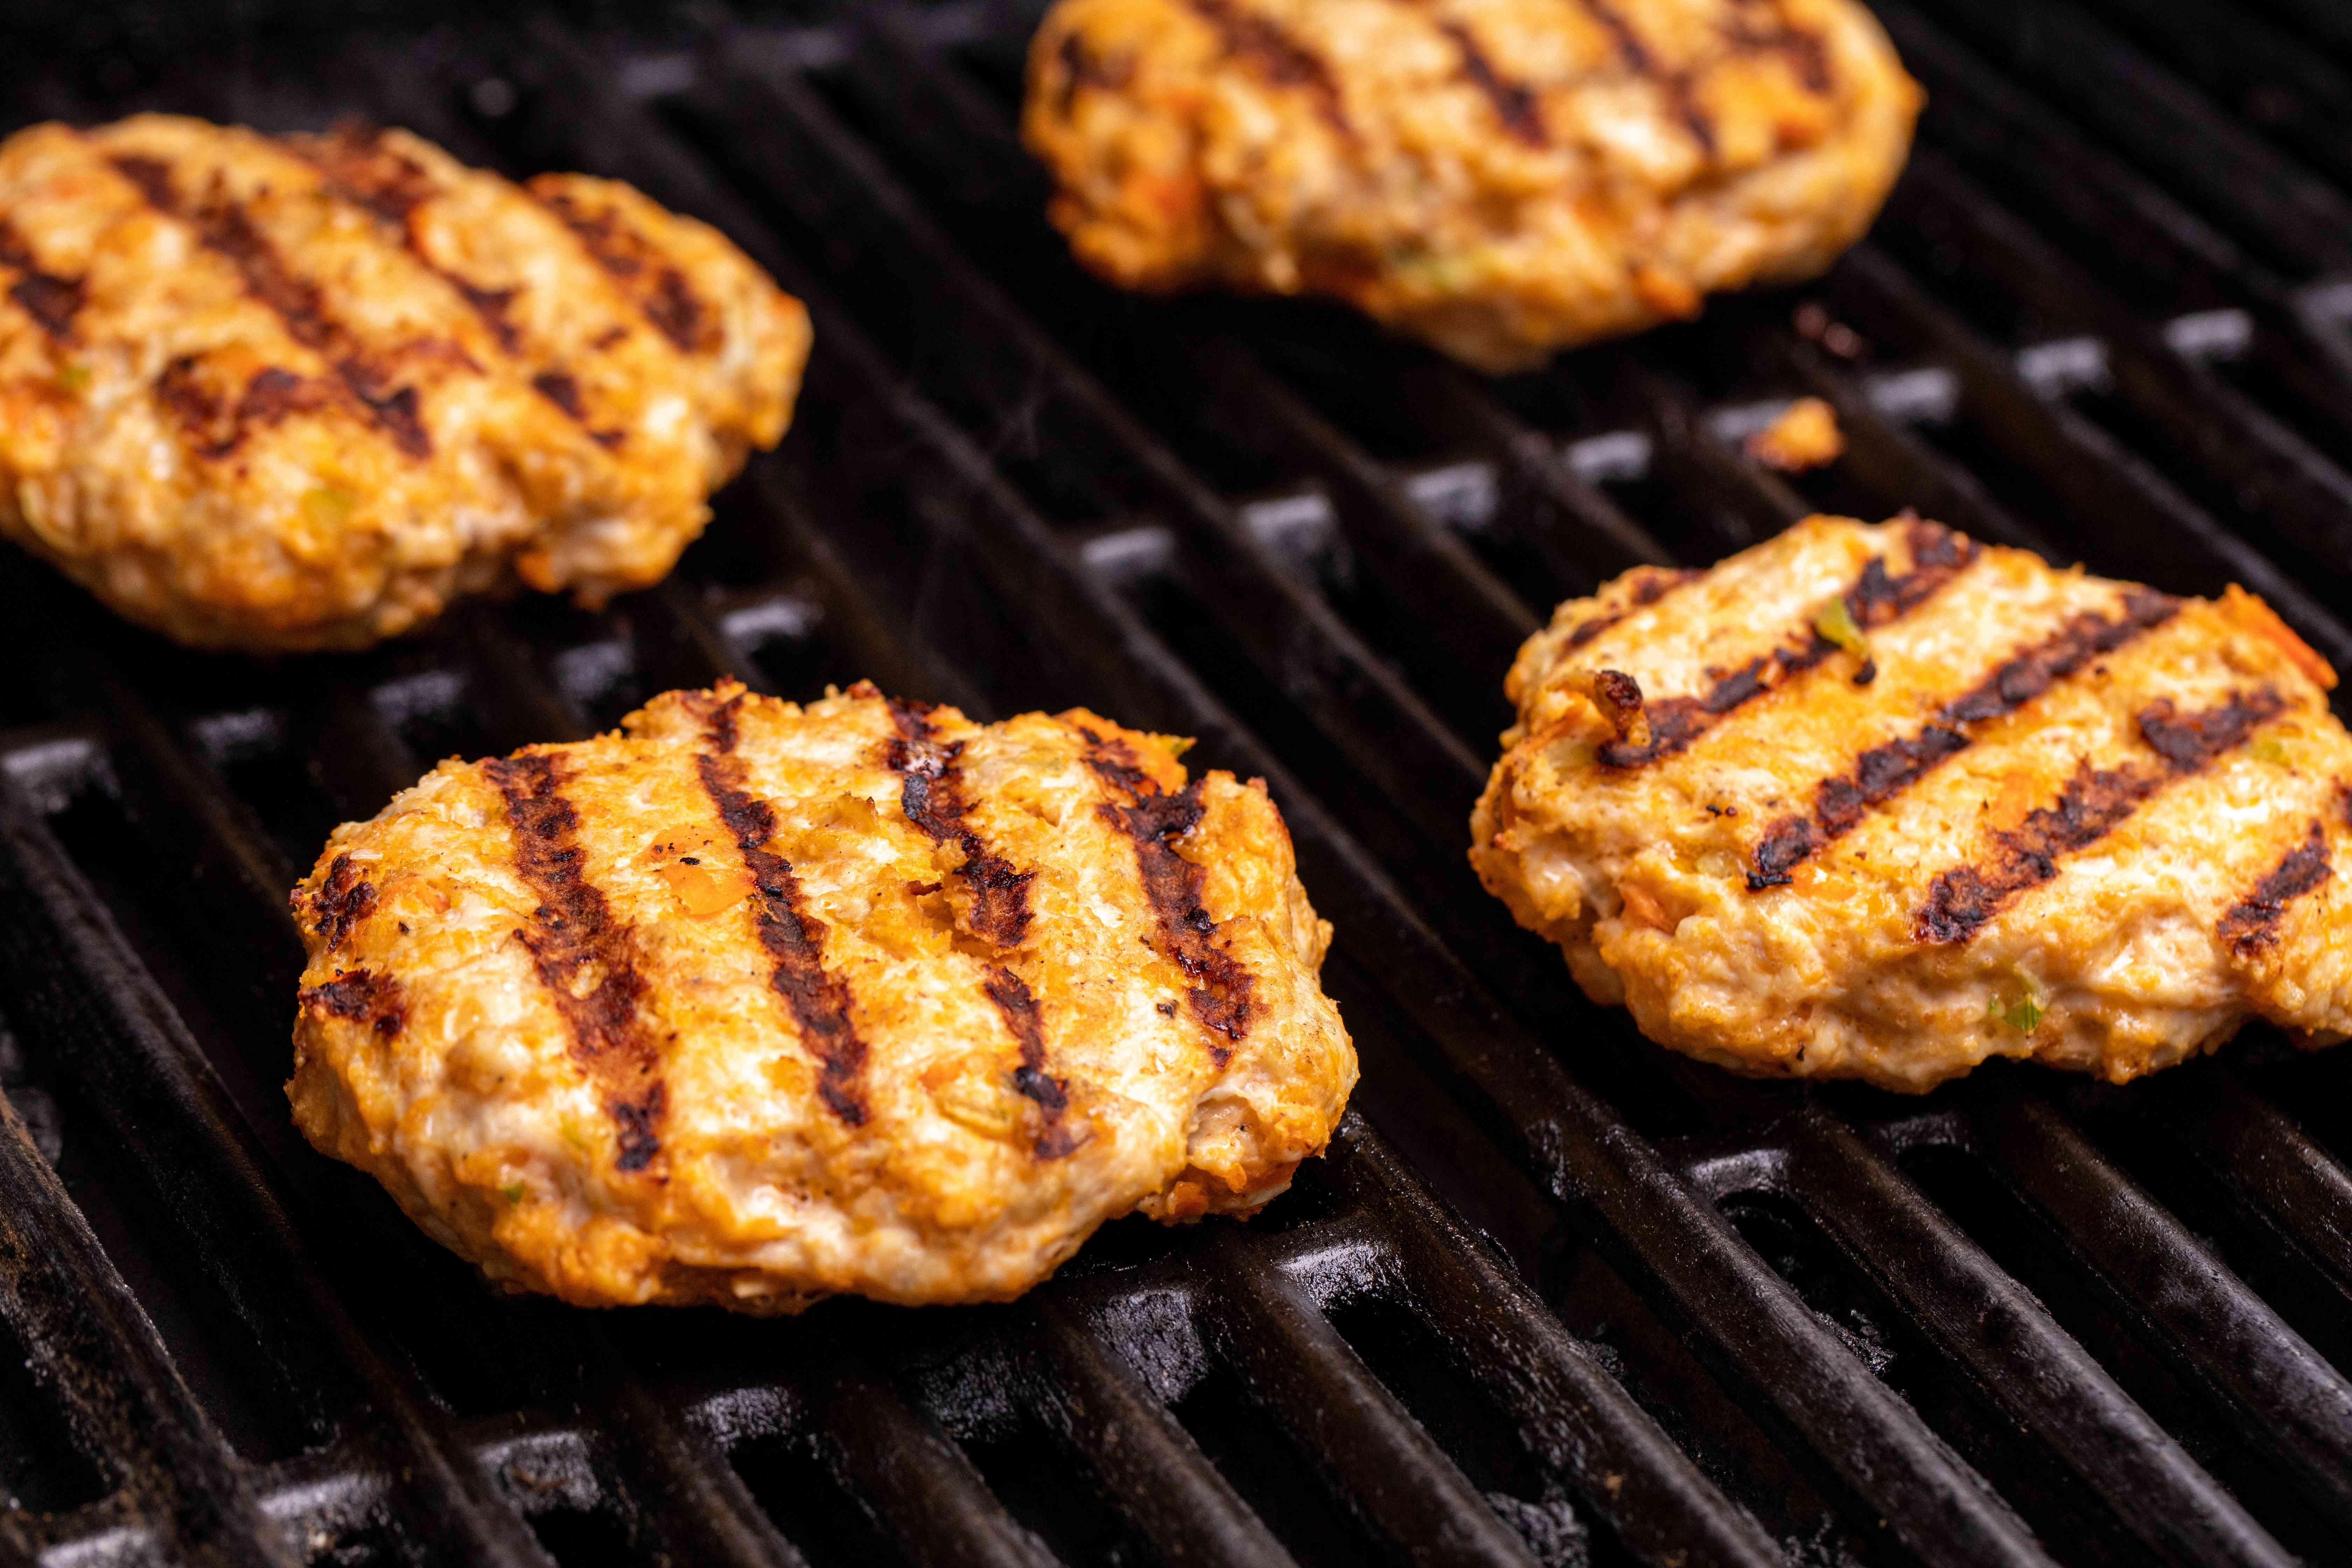 Grilling Buffalo chicken burgers.